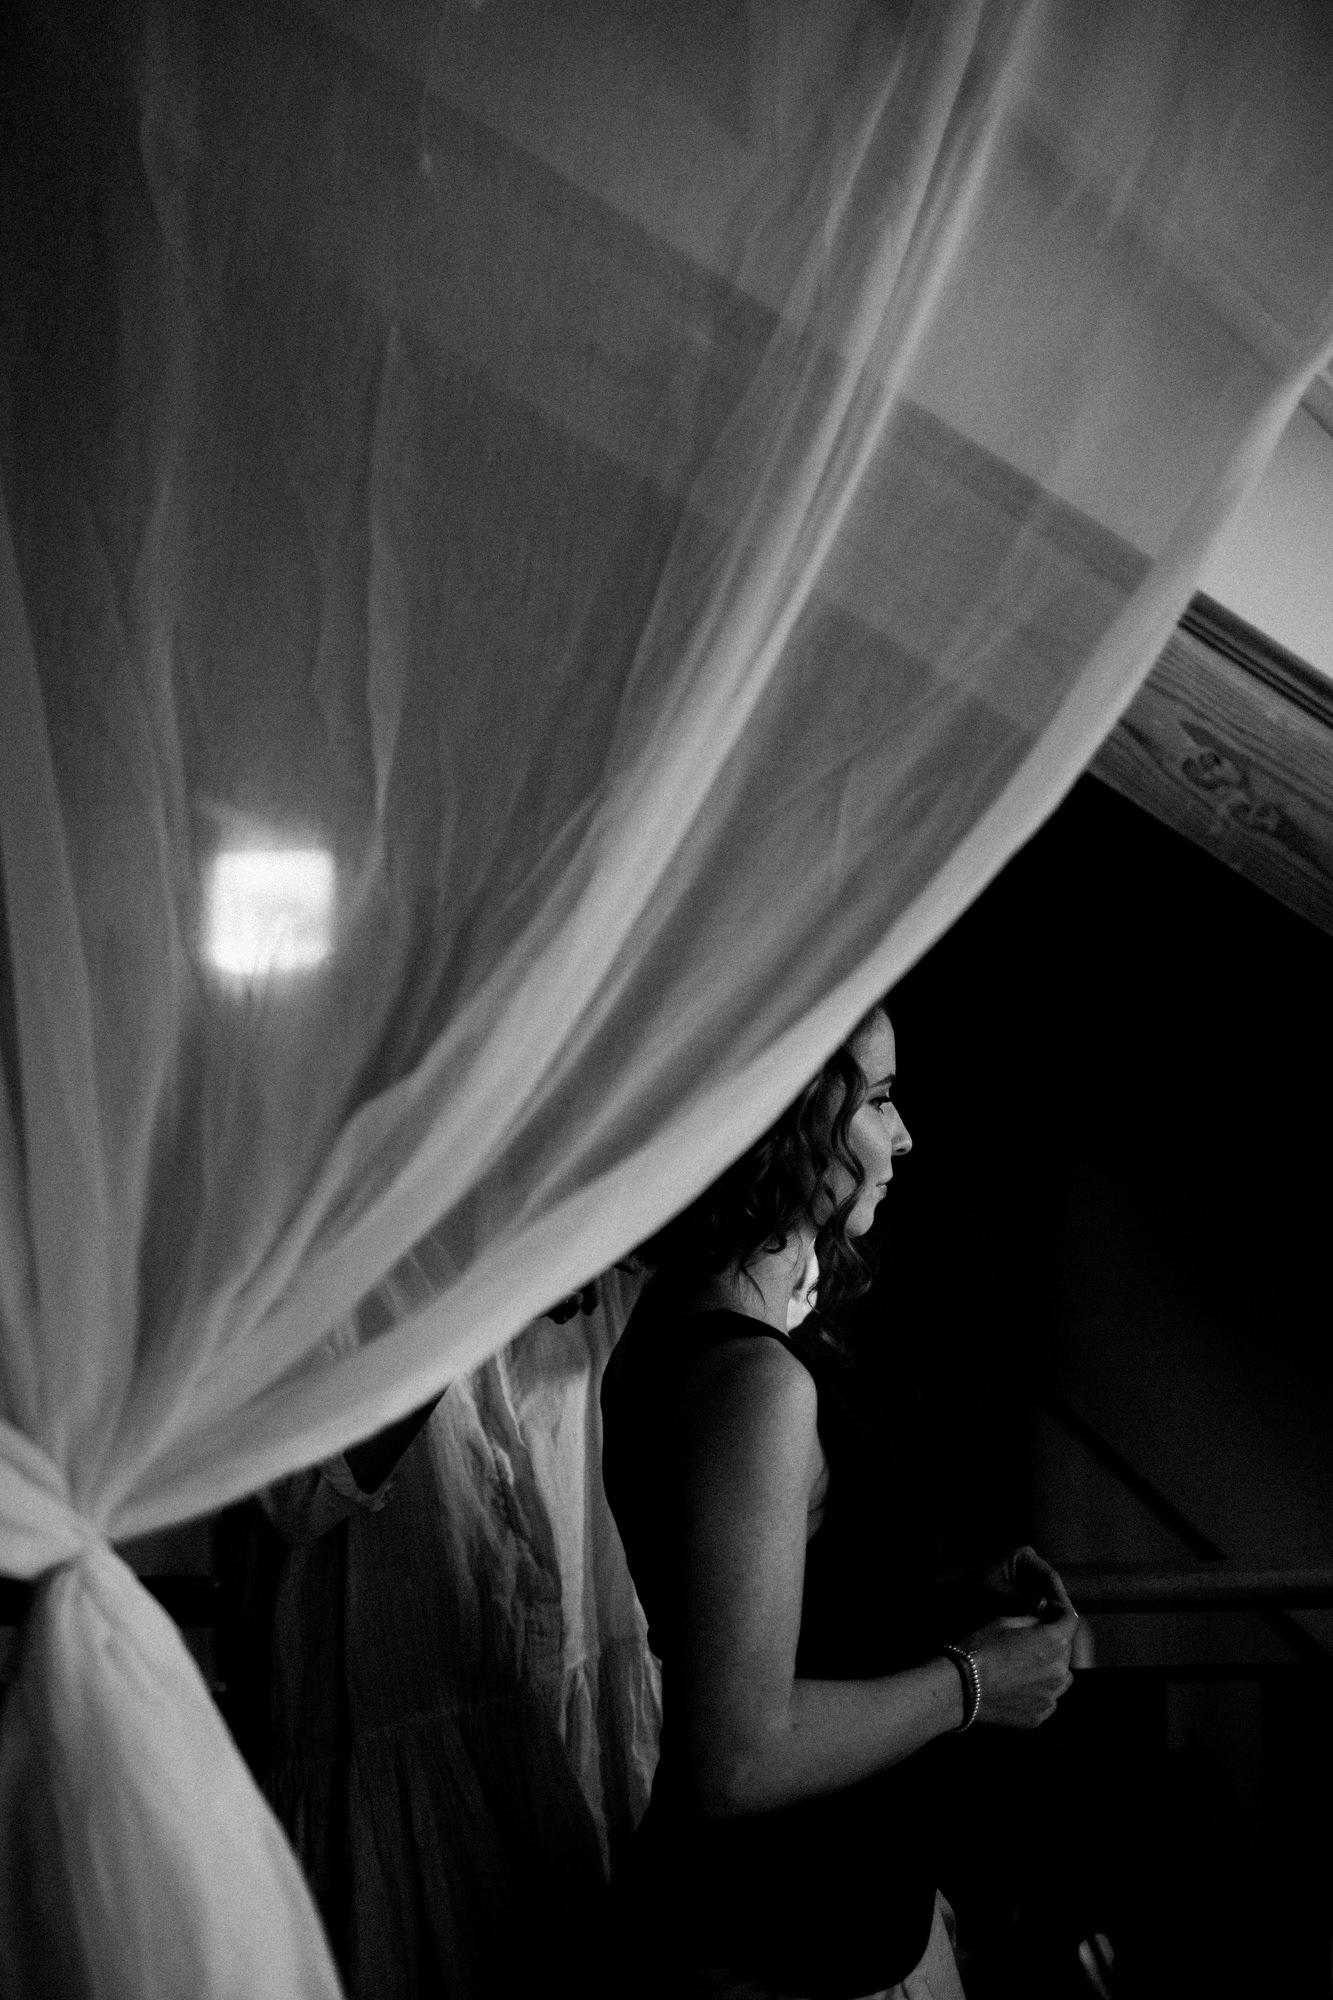 Petrou & Dwyer - CARTER & ROSE PHOTOGRAPHY-23.JPG